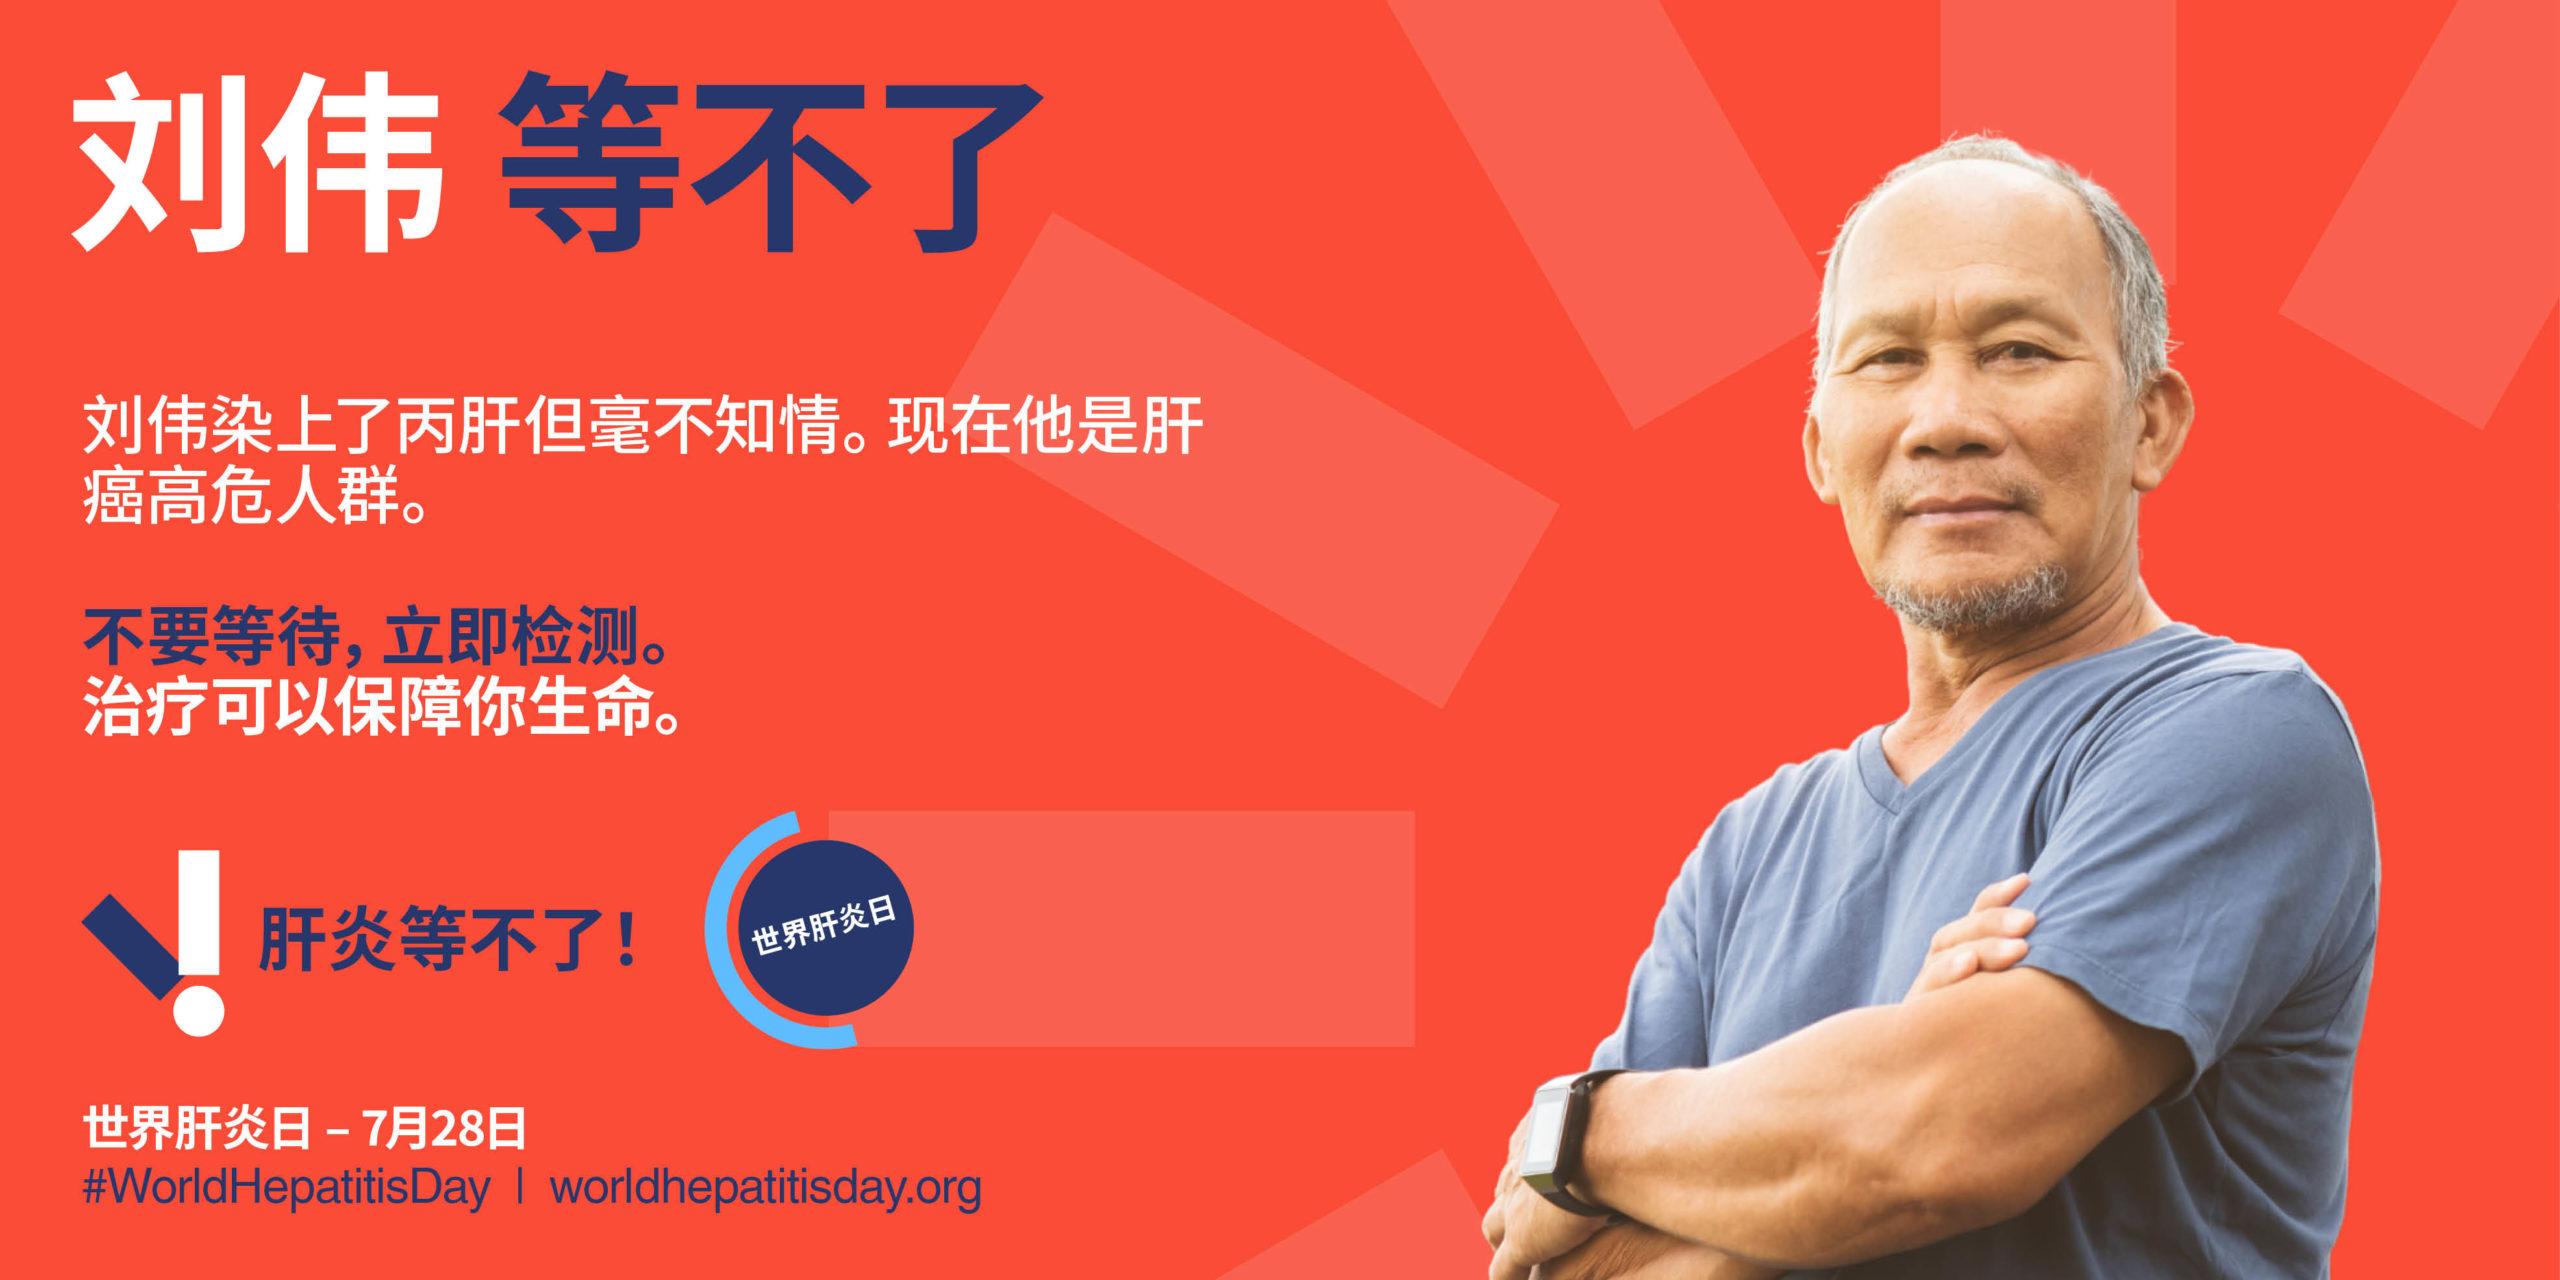 刘伟 等不了 Social Poster